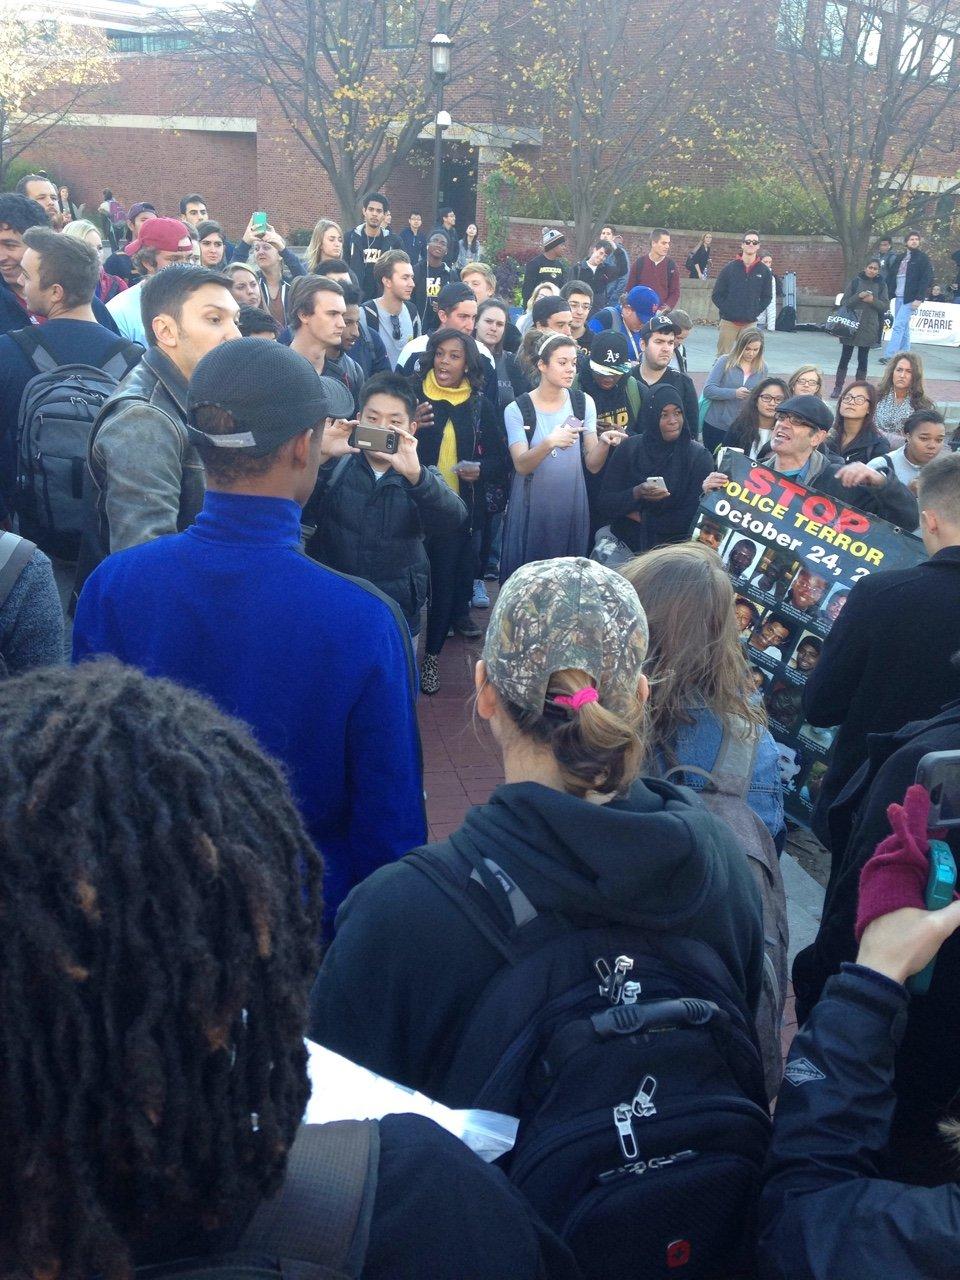 Revolution #413, November 16, 2015